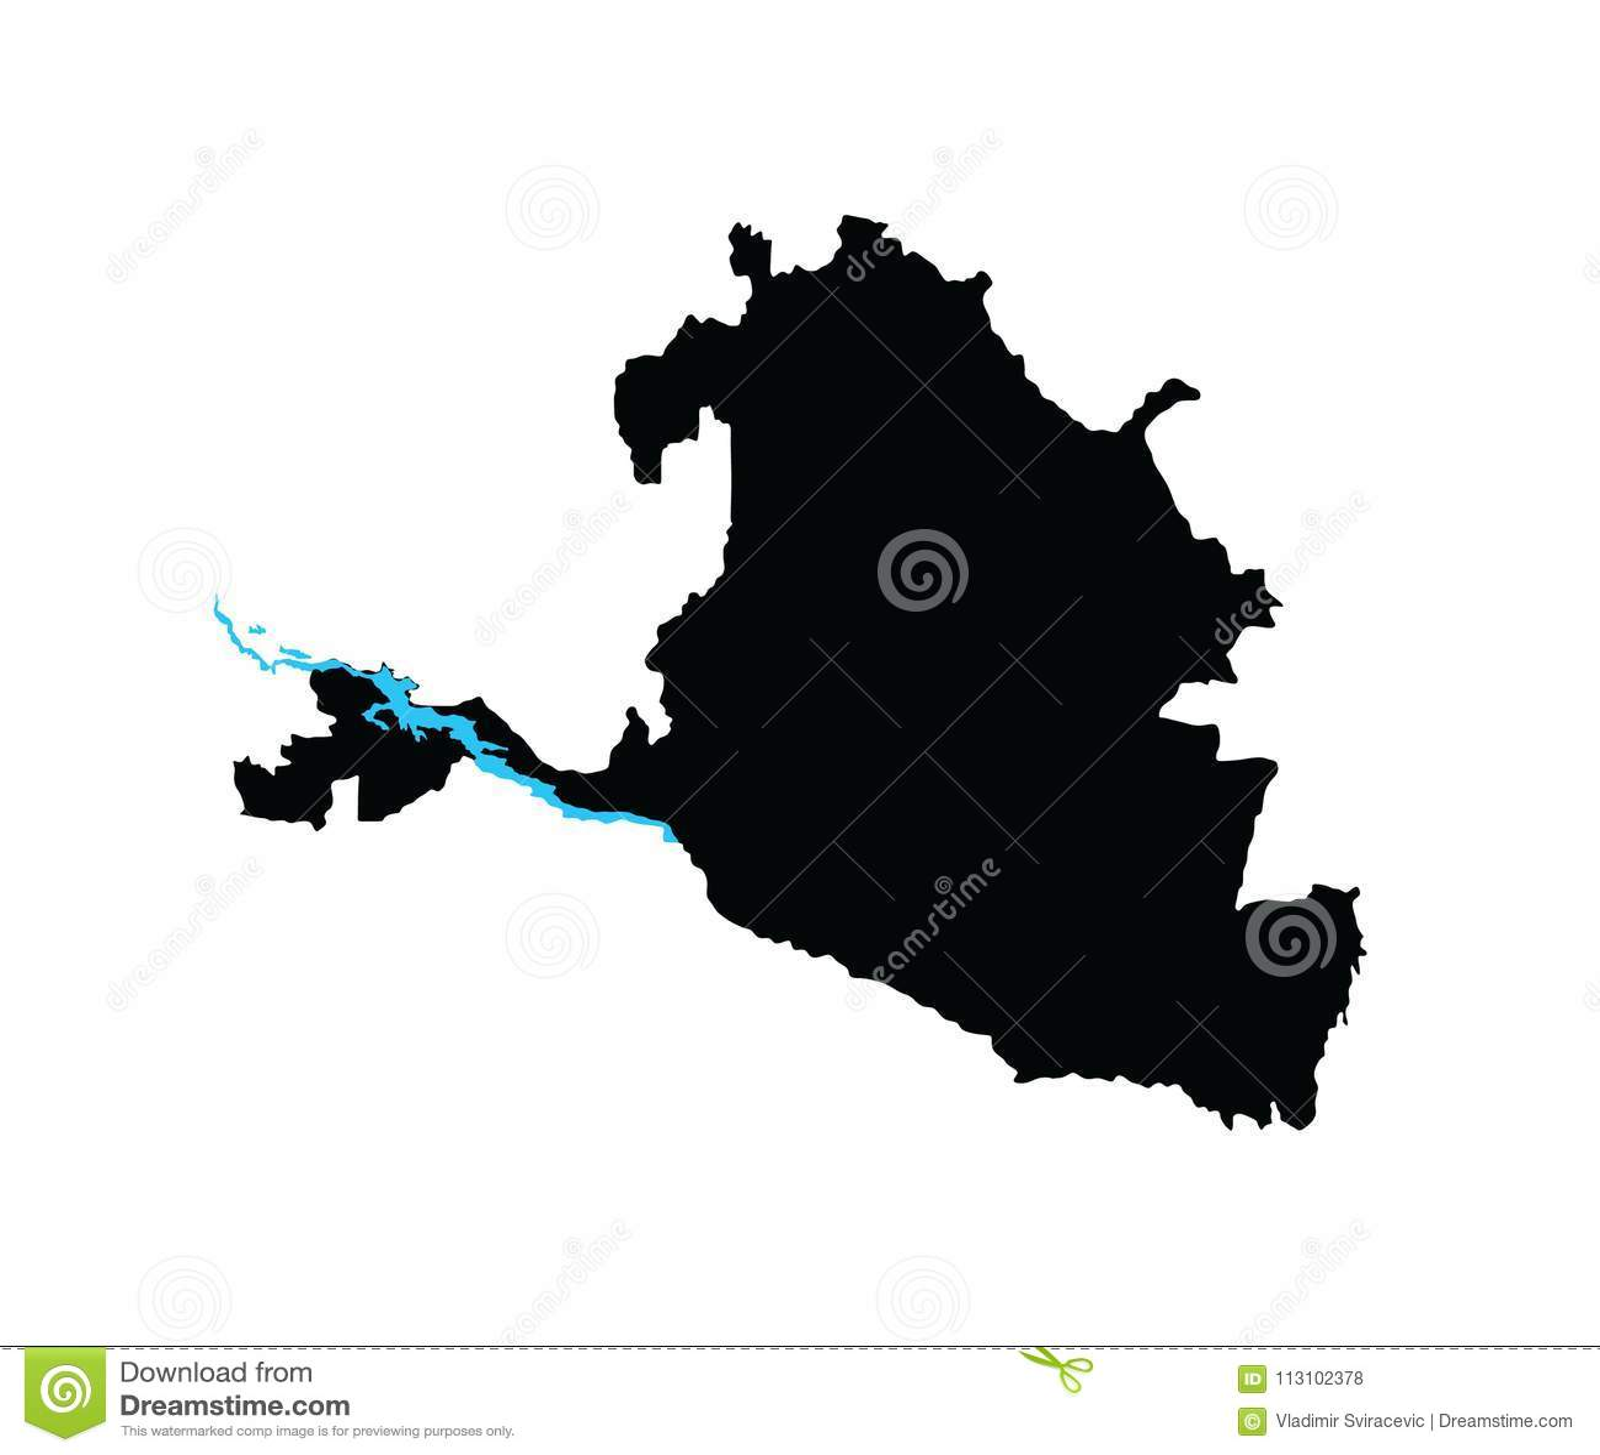 Republic Of Kalmykia Map . Russia Oblast Map Illustration. Kaluskaya on chuvashia russia map, croatia russia map, tuva russia map, jewish autonomous oblast russia map, slovakia russia map, sakha russia map, canada russia map, iceland russia map, afghanistan russia map, elista russia map, albania russia map, malta russia map, altai krai russia map, south ossetia russia map, tyva russia map, novy urengoy russia map, khakassia russia map, india russia map, tatarstan russia map, france russia map,